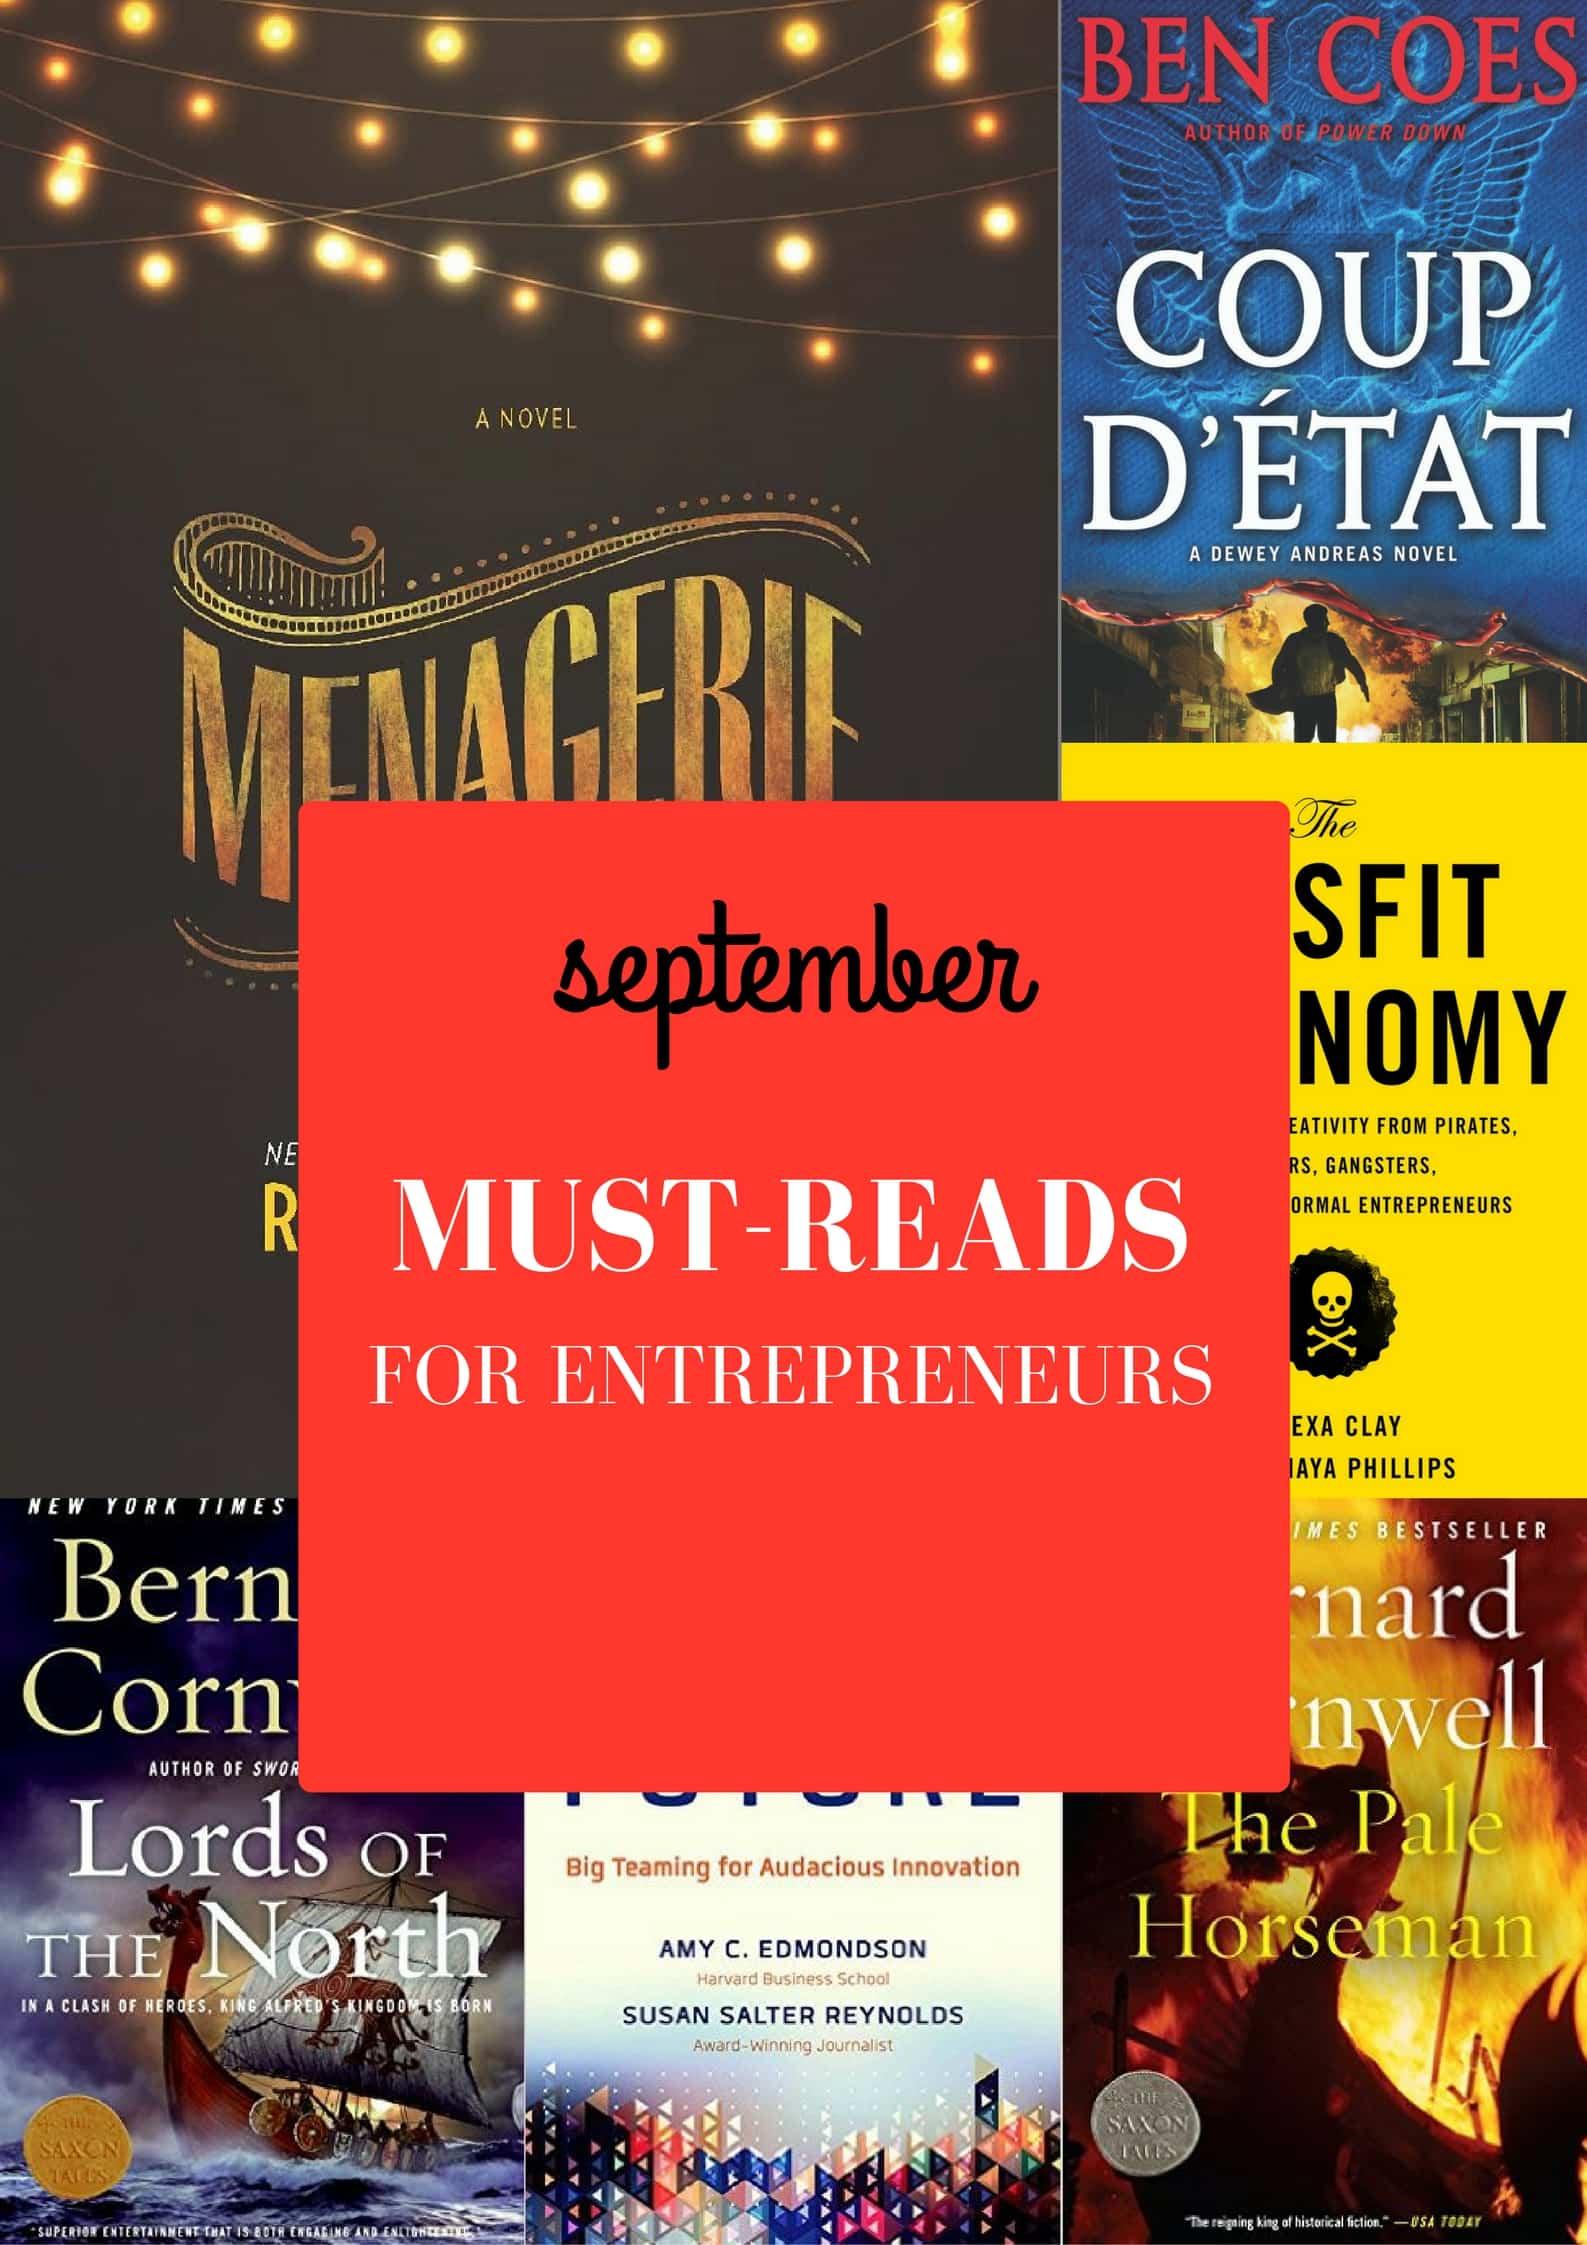 The Reading Life of an Entrepreneur: September Must-Reads